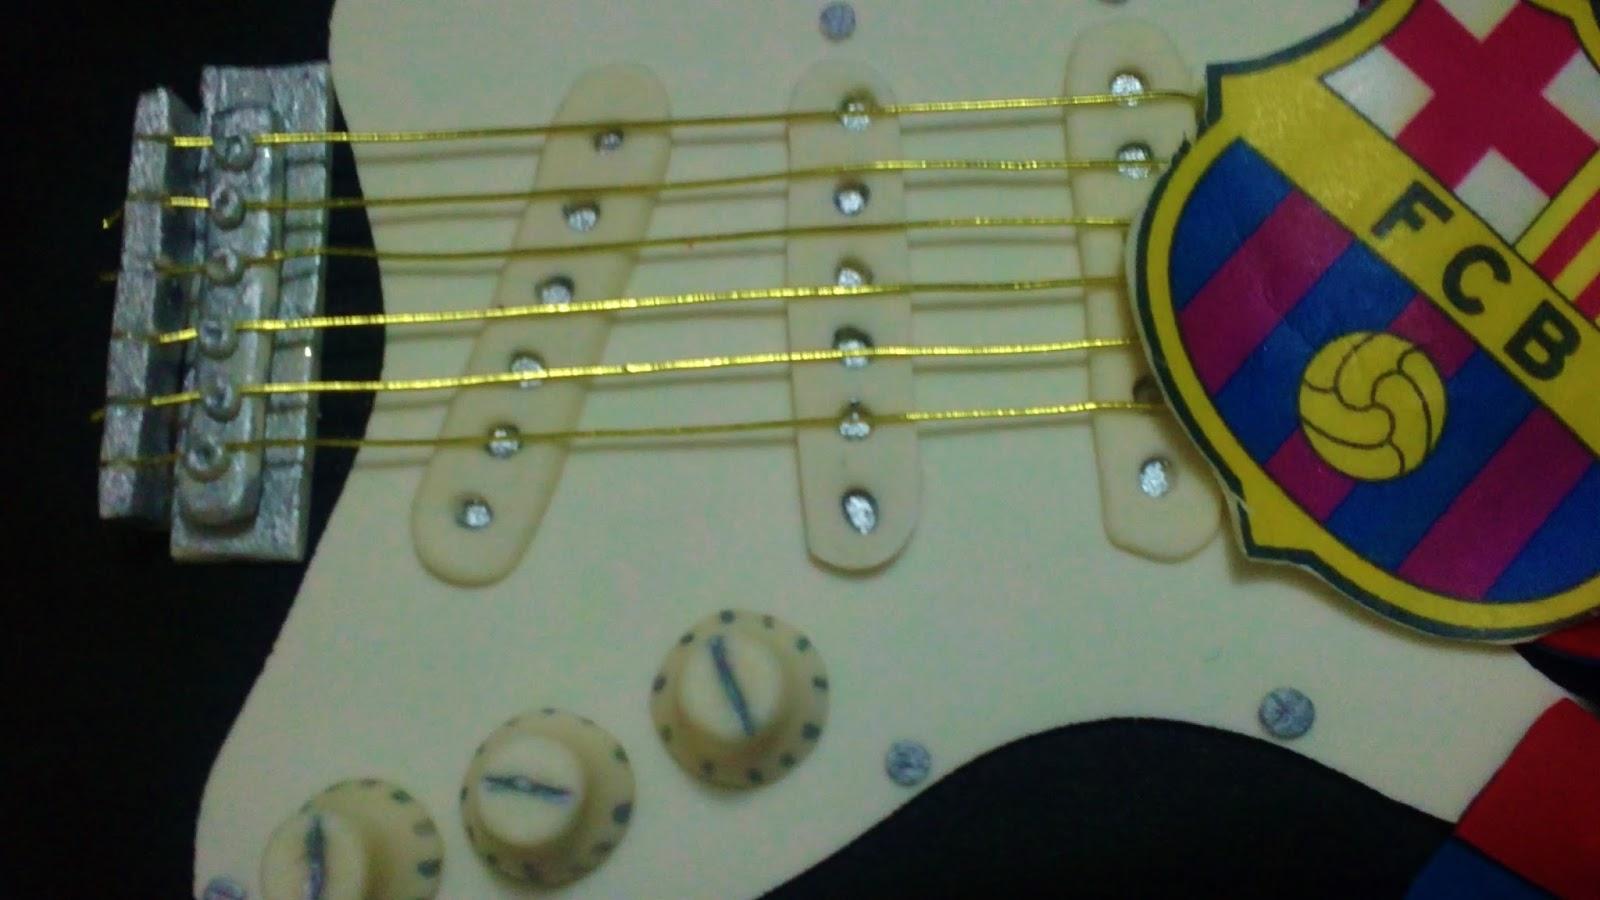 Mundo tortas guitarra electrica barcelona for Guitarras barcelona